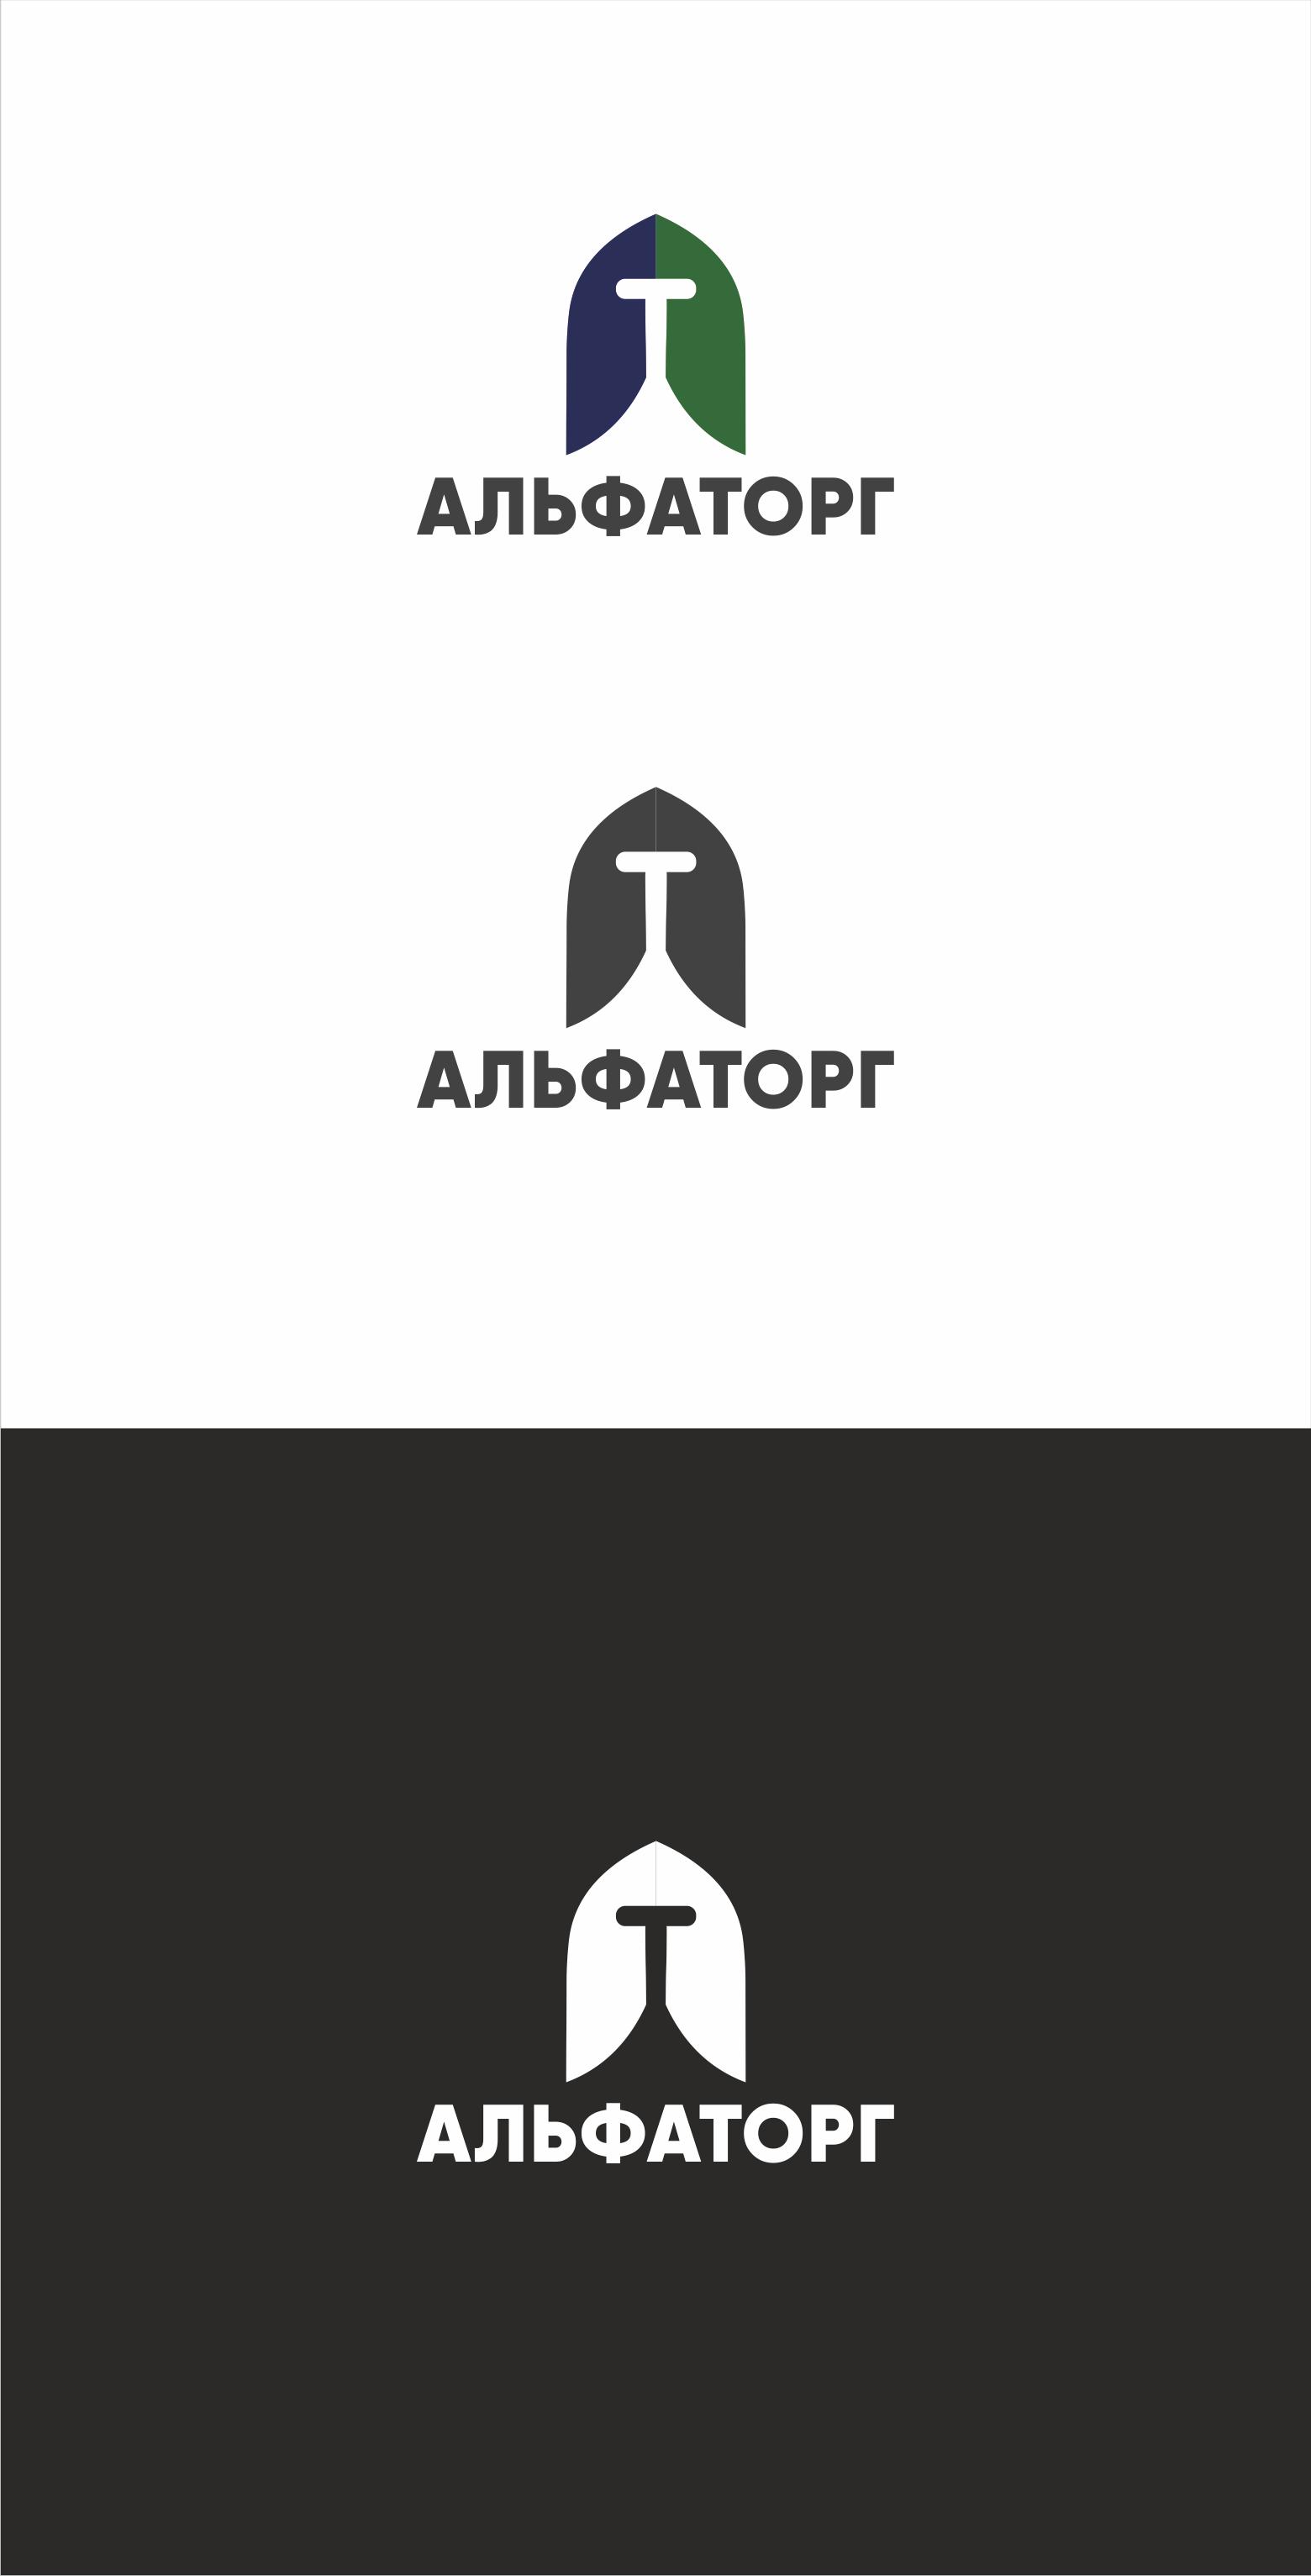 Логотип и фирменный стиль фото f_3225ef772745ecdc.png